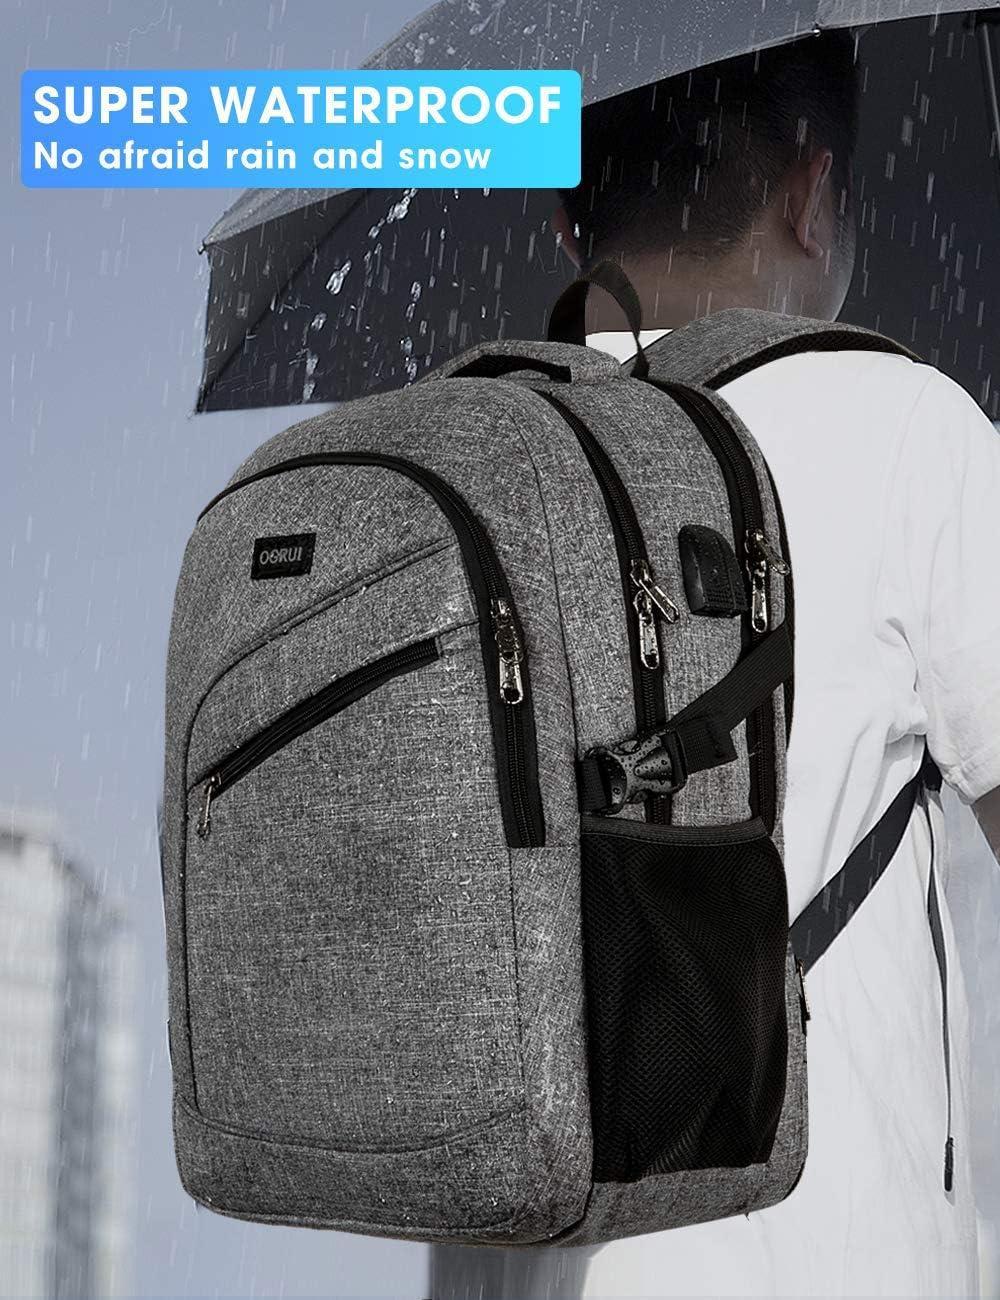 mochila para el d/ía a d/ía con puerto de carga USB Mochila para ordenador port/átil bolsa para ordenador port/átil para hombre y mujer mochila impermeable para el d/ía a d/ía mochila escolar de viaje